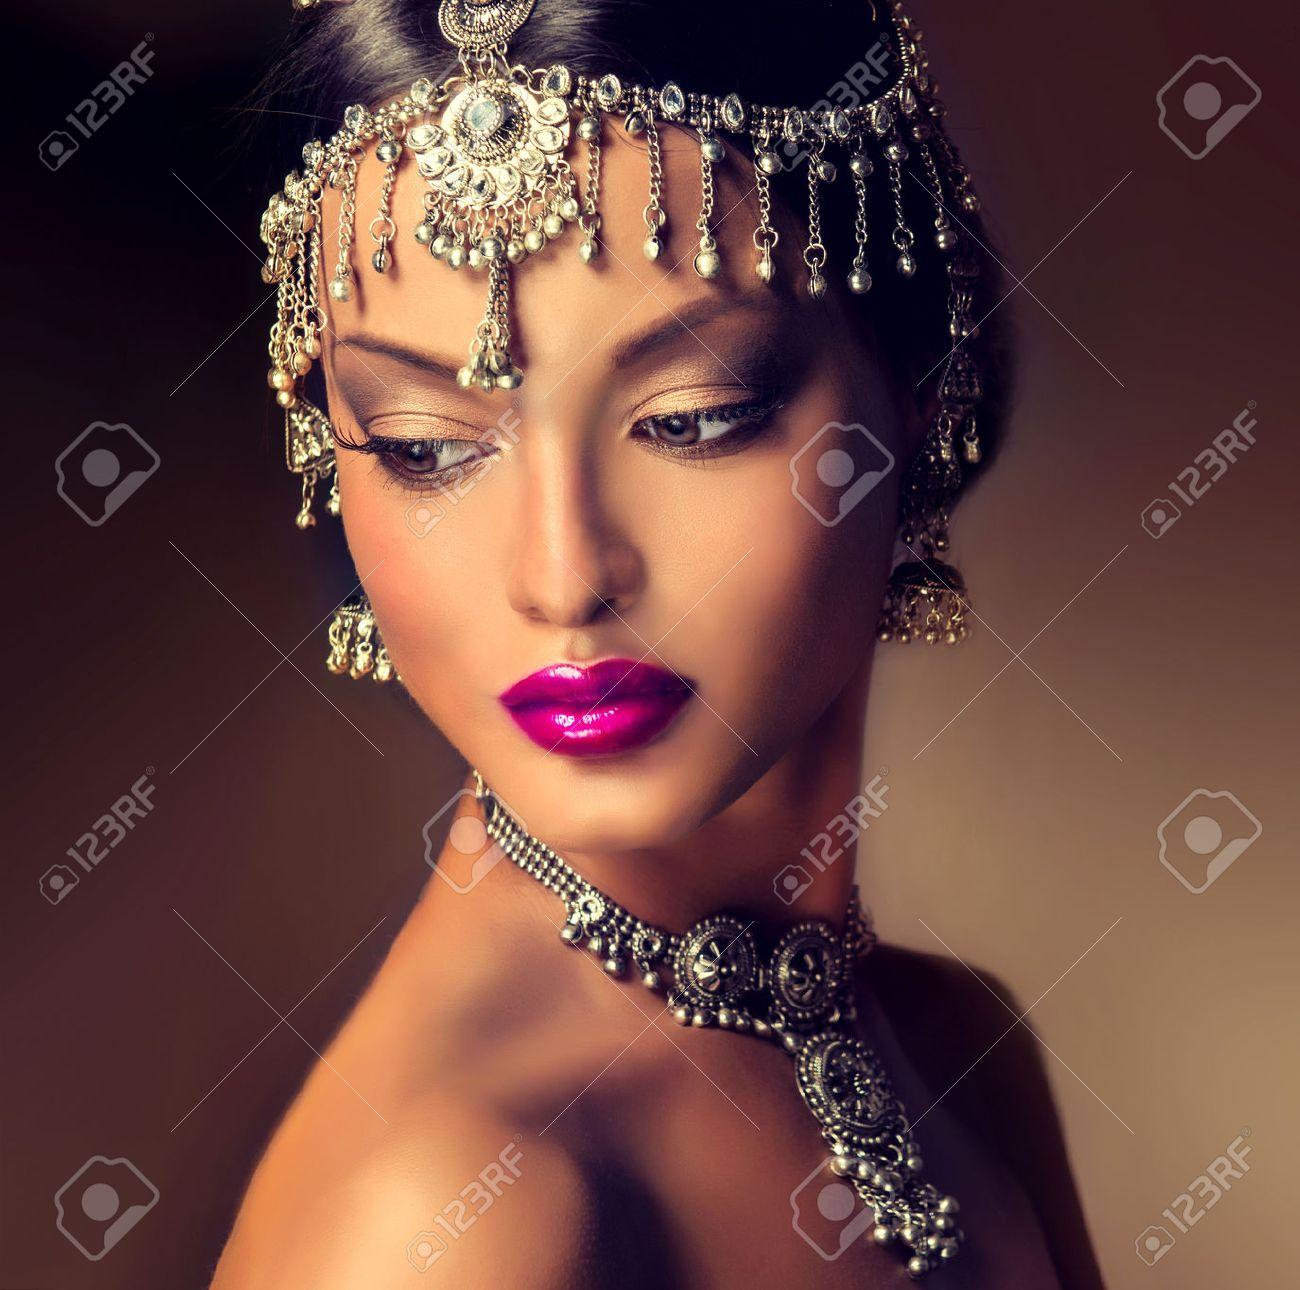 Beautiful Indian Women Portrait With Jewelry. Elegant Indian ...